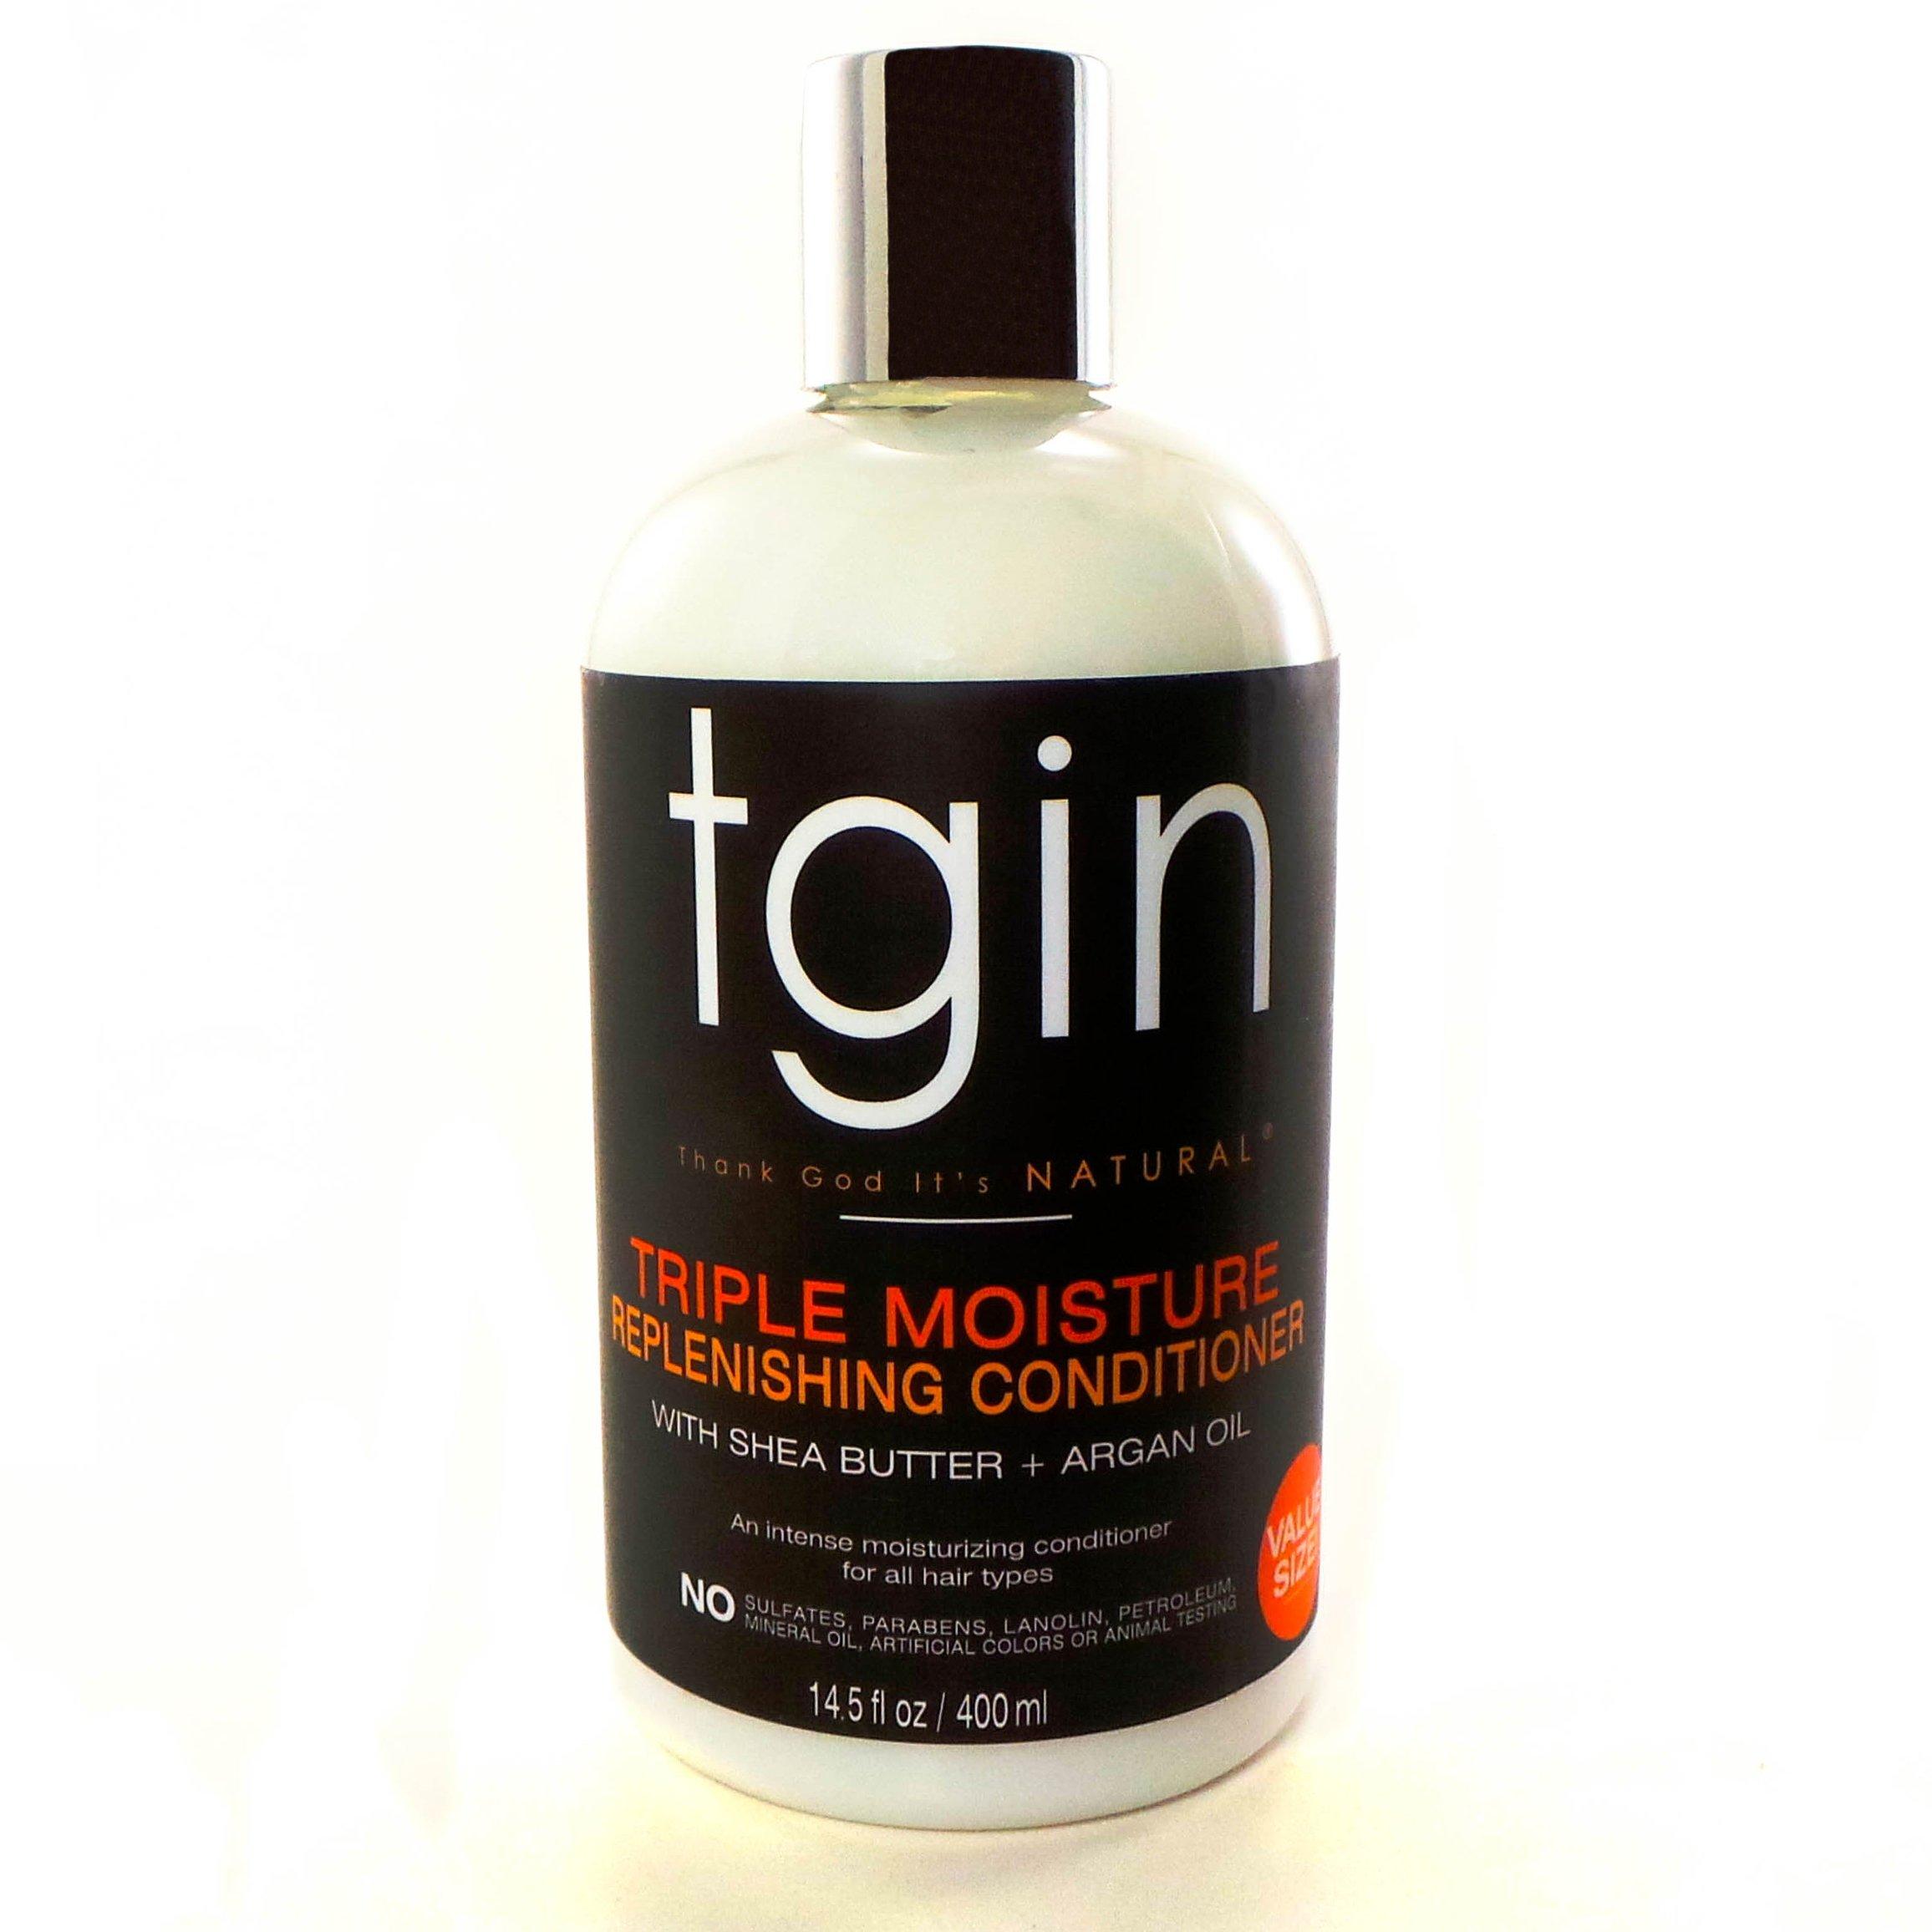 Tgin Triple Moisture Replenishing Conditioner for Natural Hair, 13oz